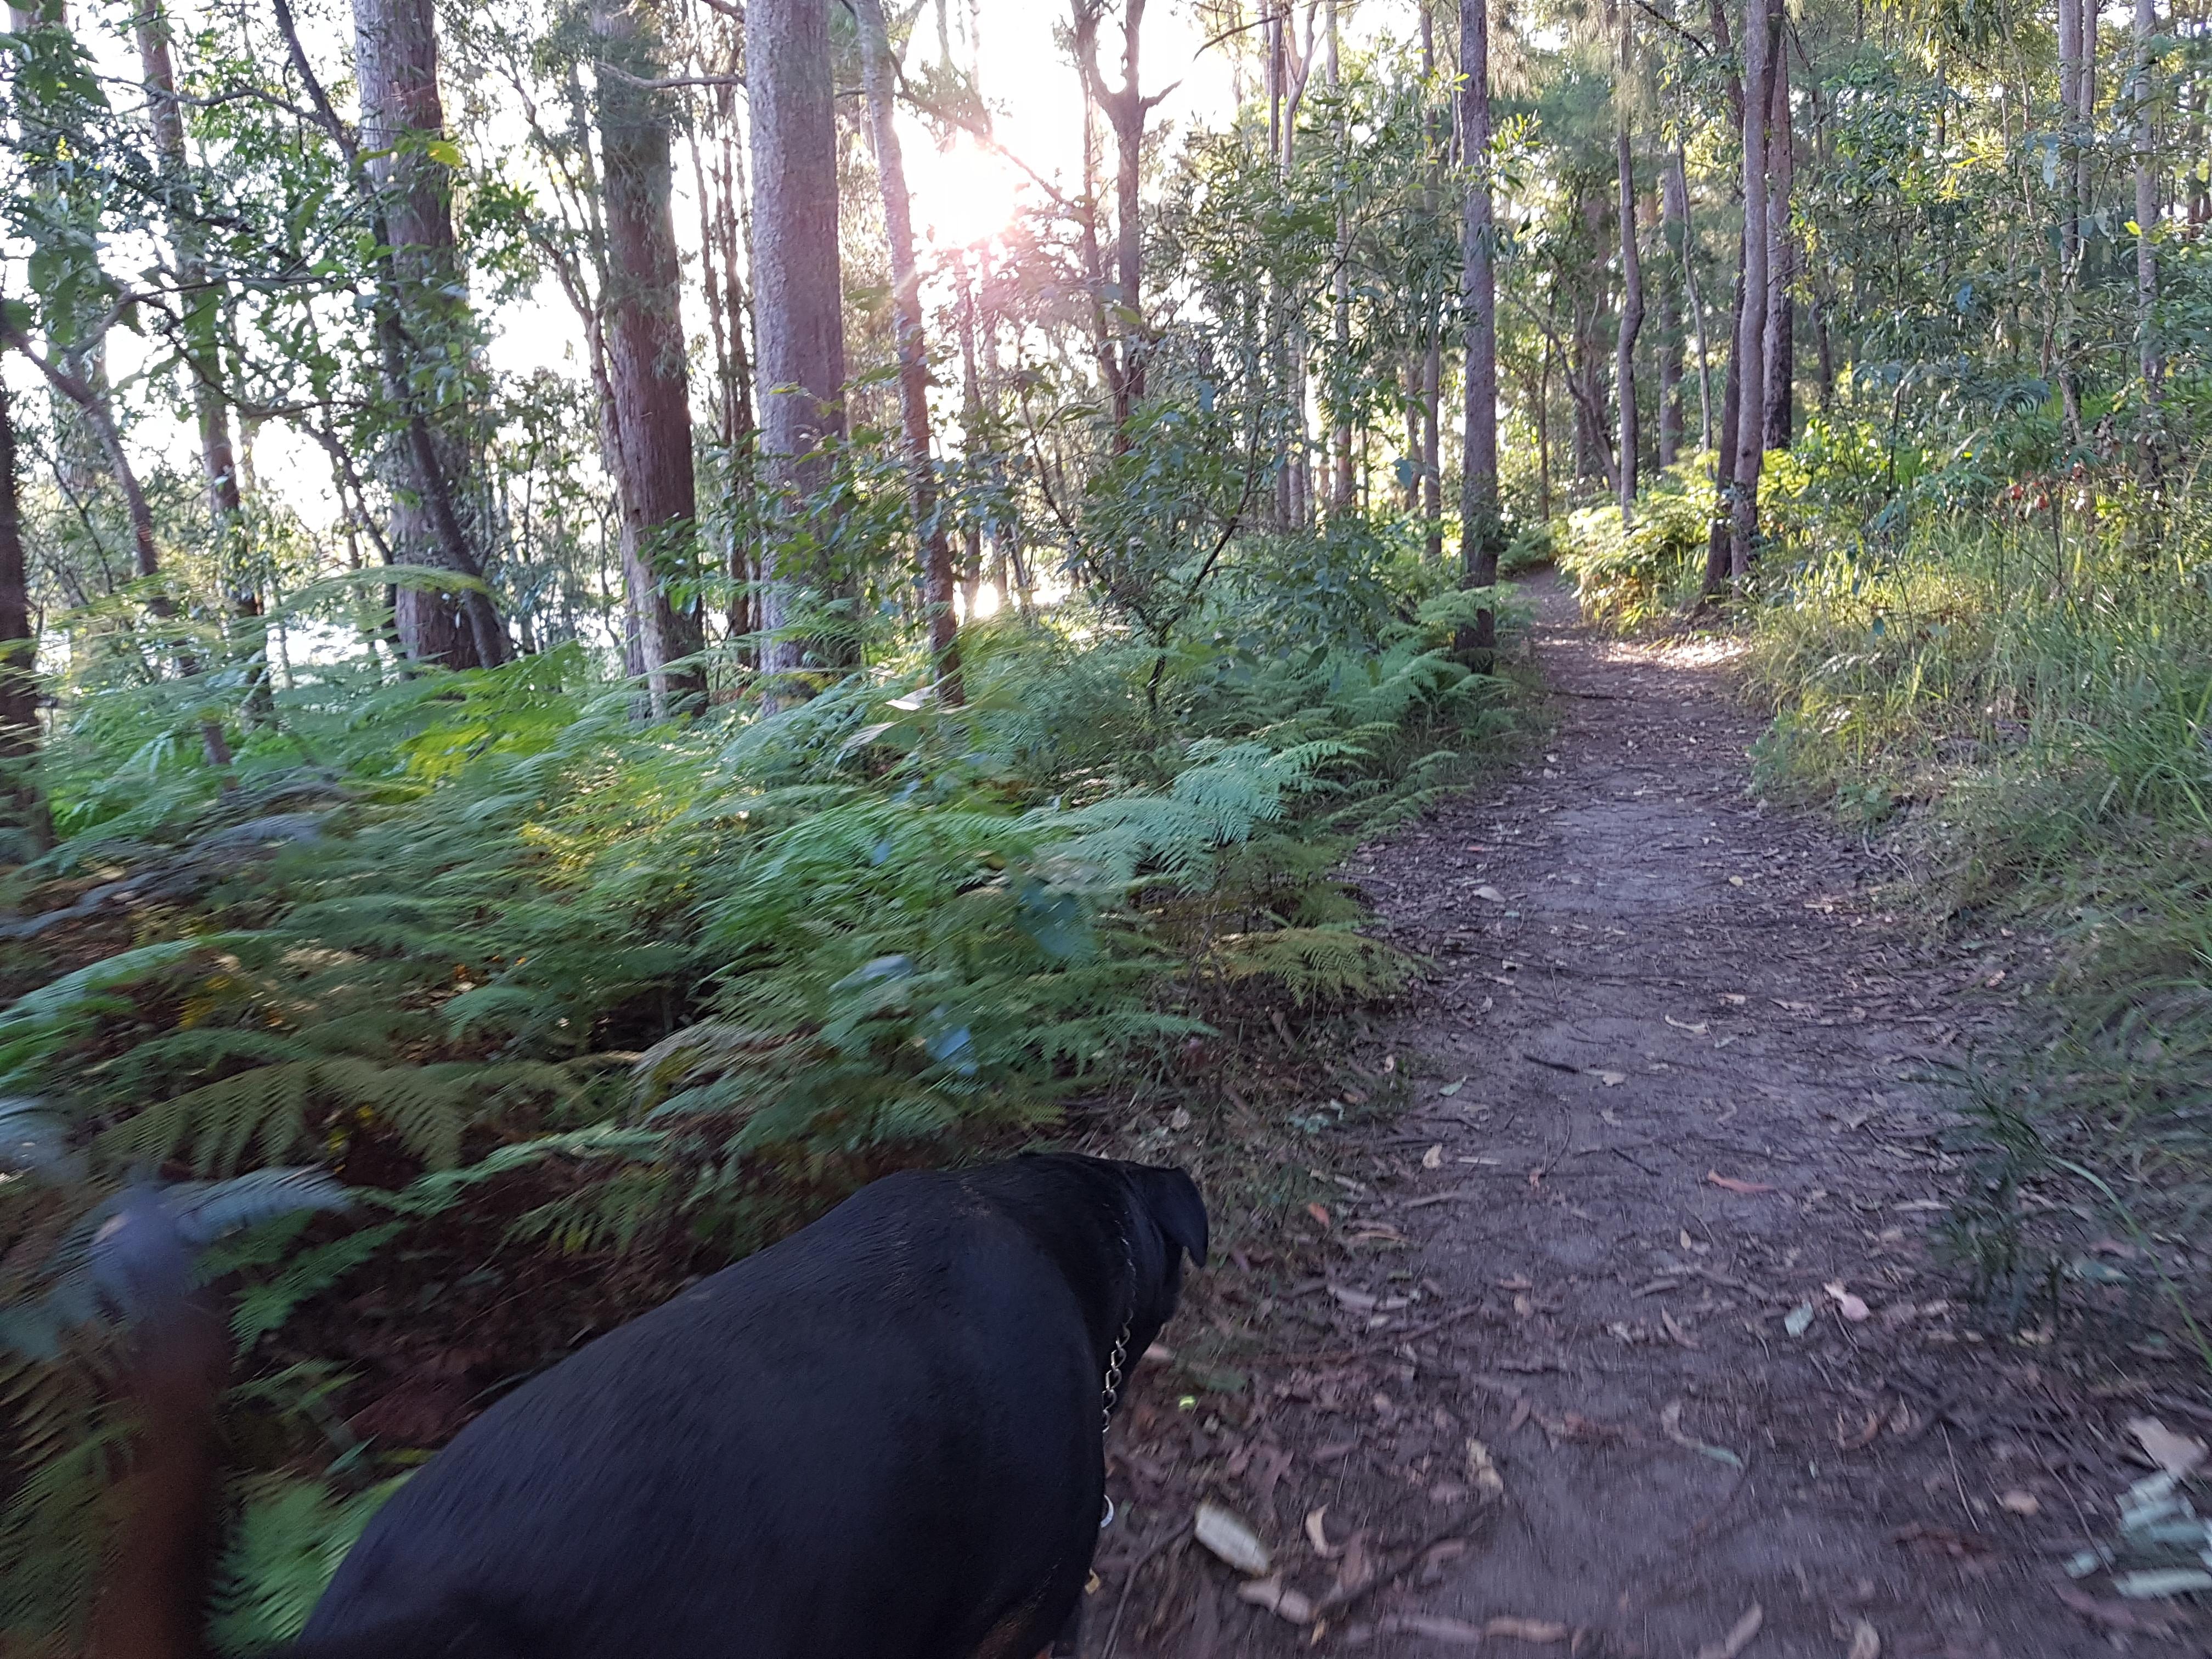 Dog Day Adventure